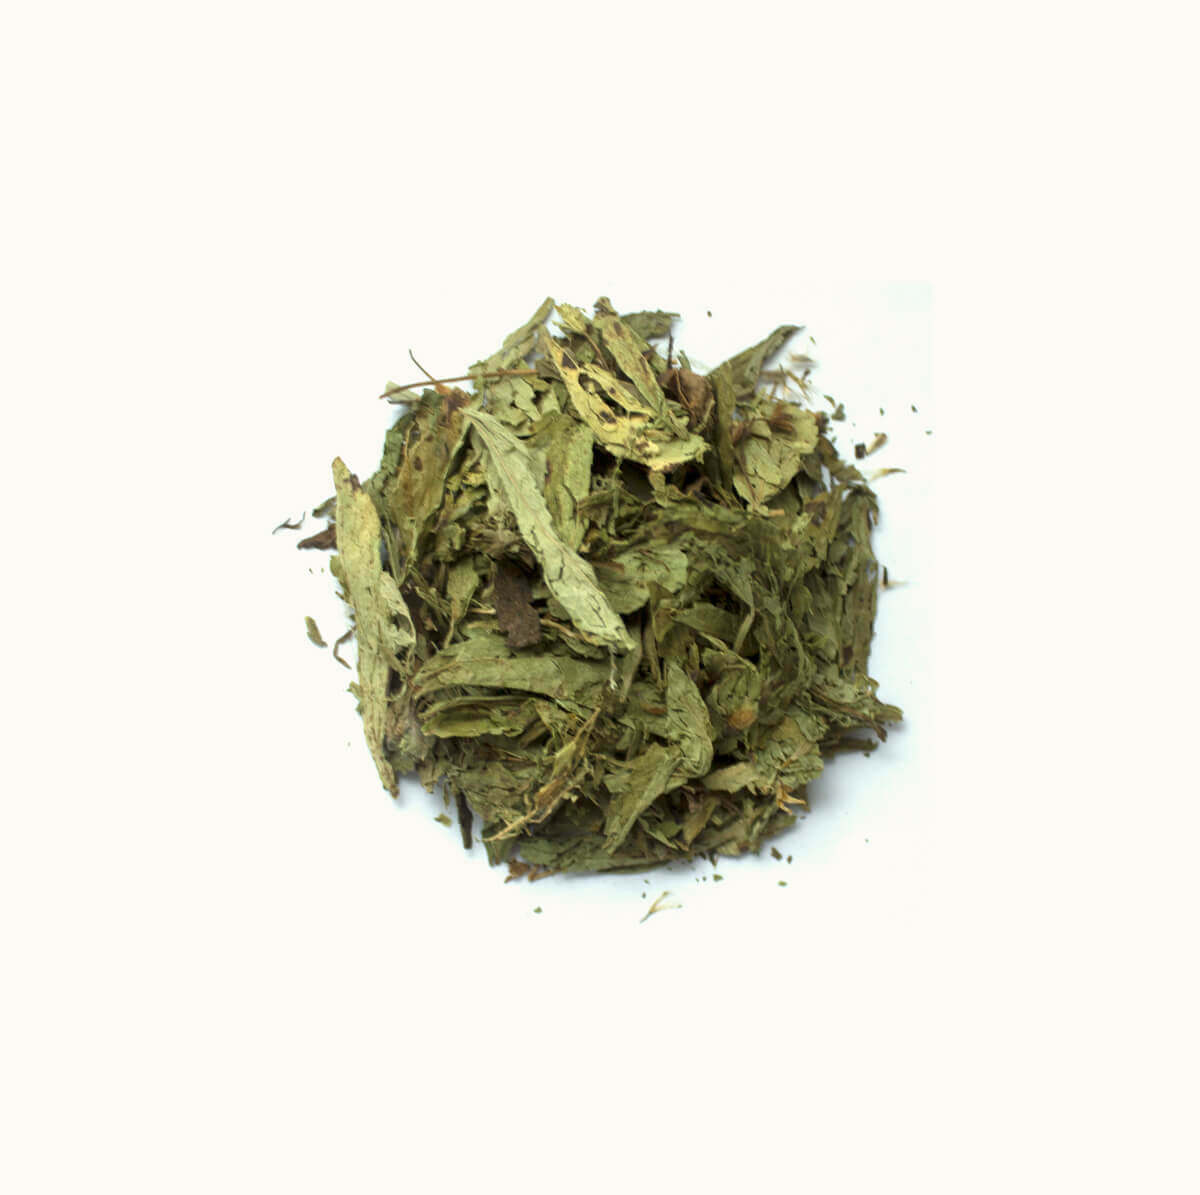 STEVIA - Stevia rebaudiana - 30g